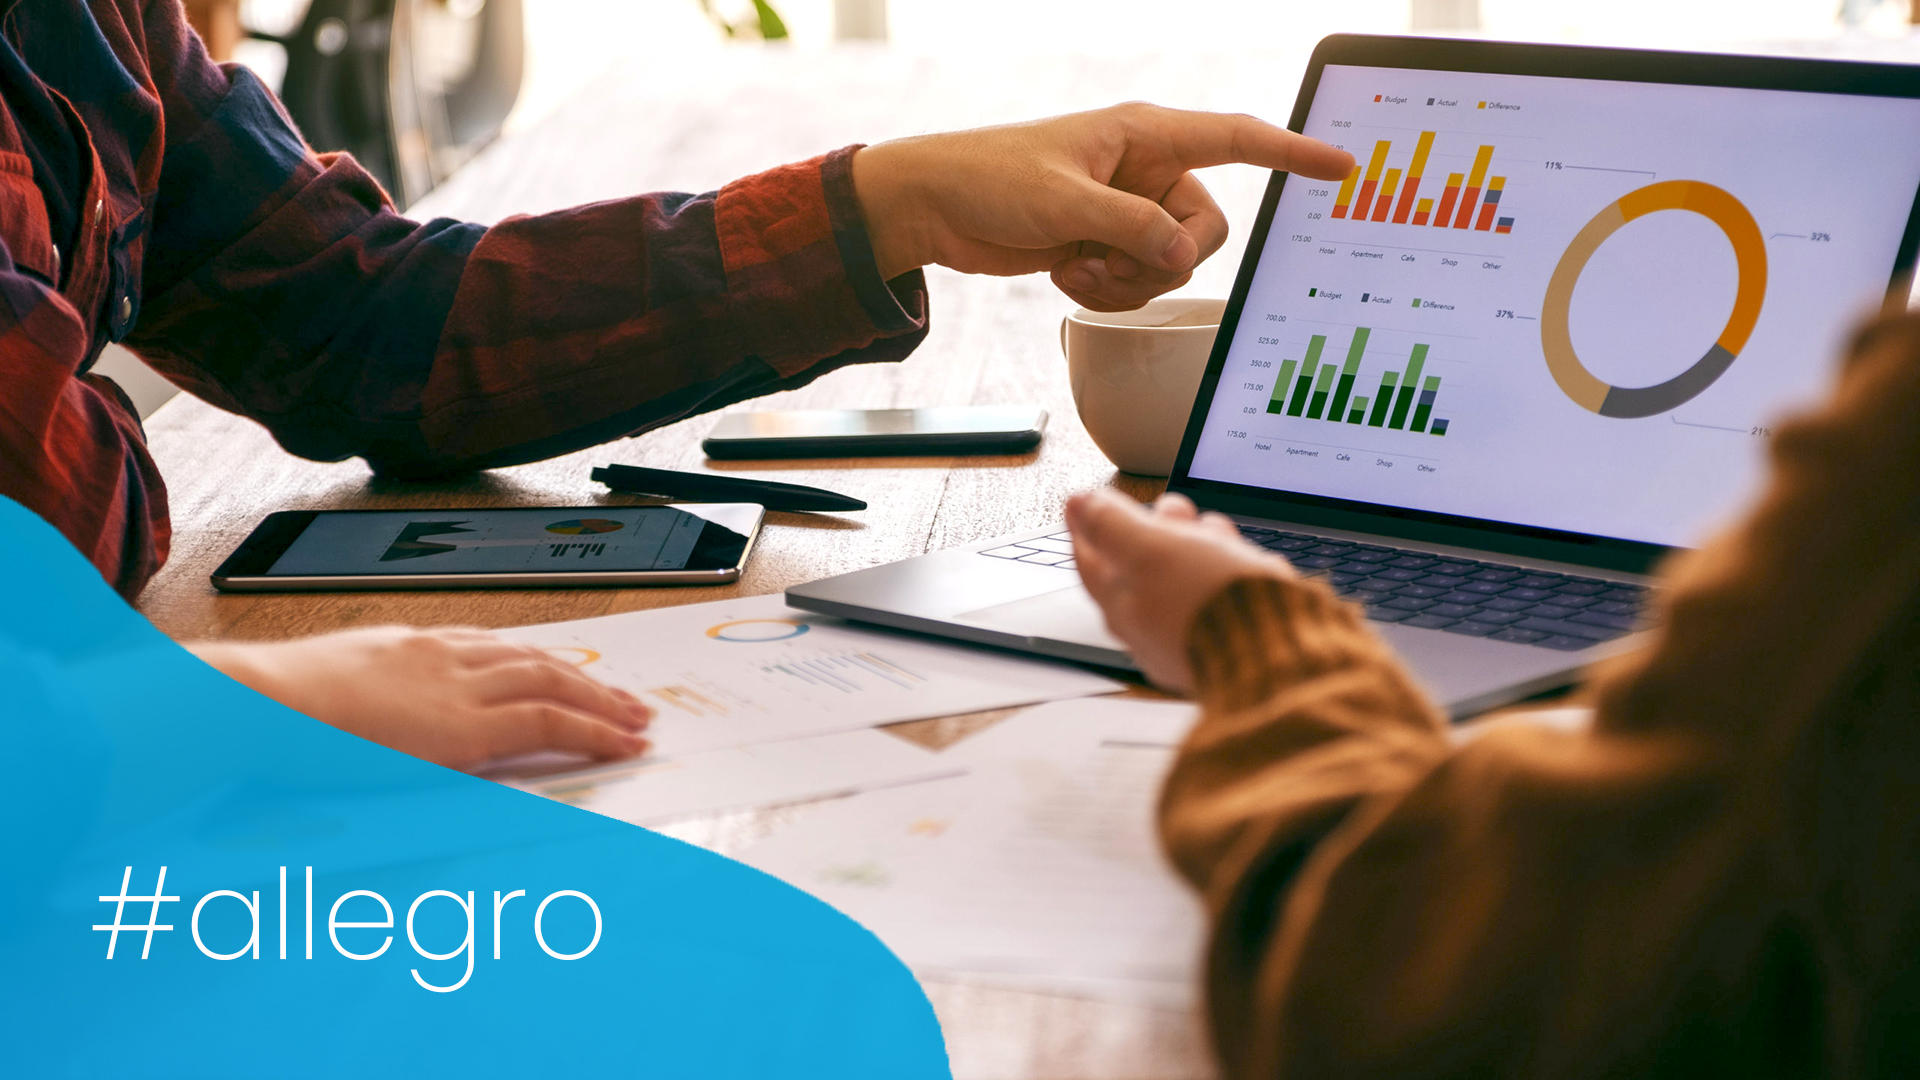 Czy Warto Promowac Oferty Na Allegro Monitoring I Automatyzacja Cen